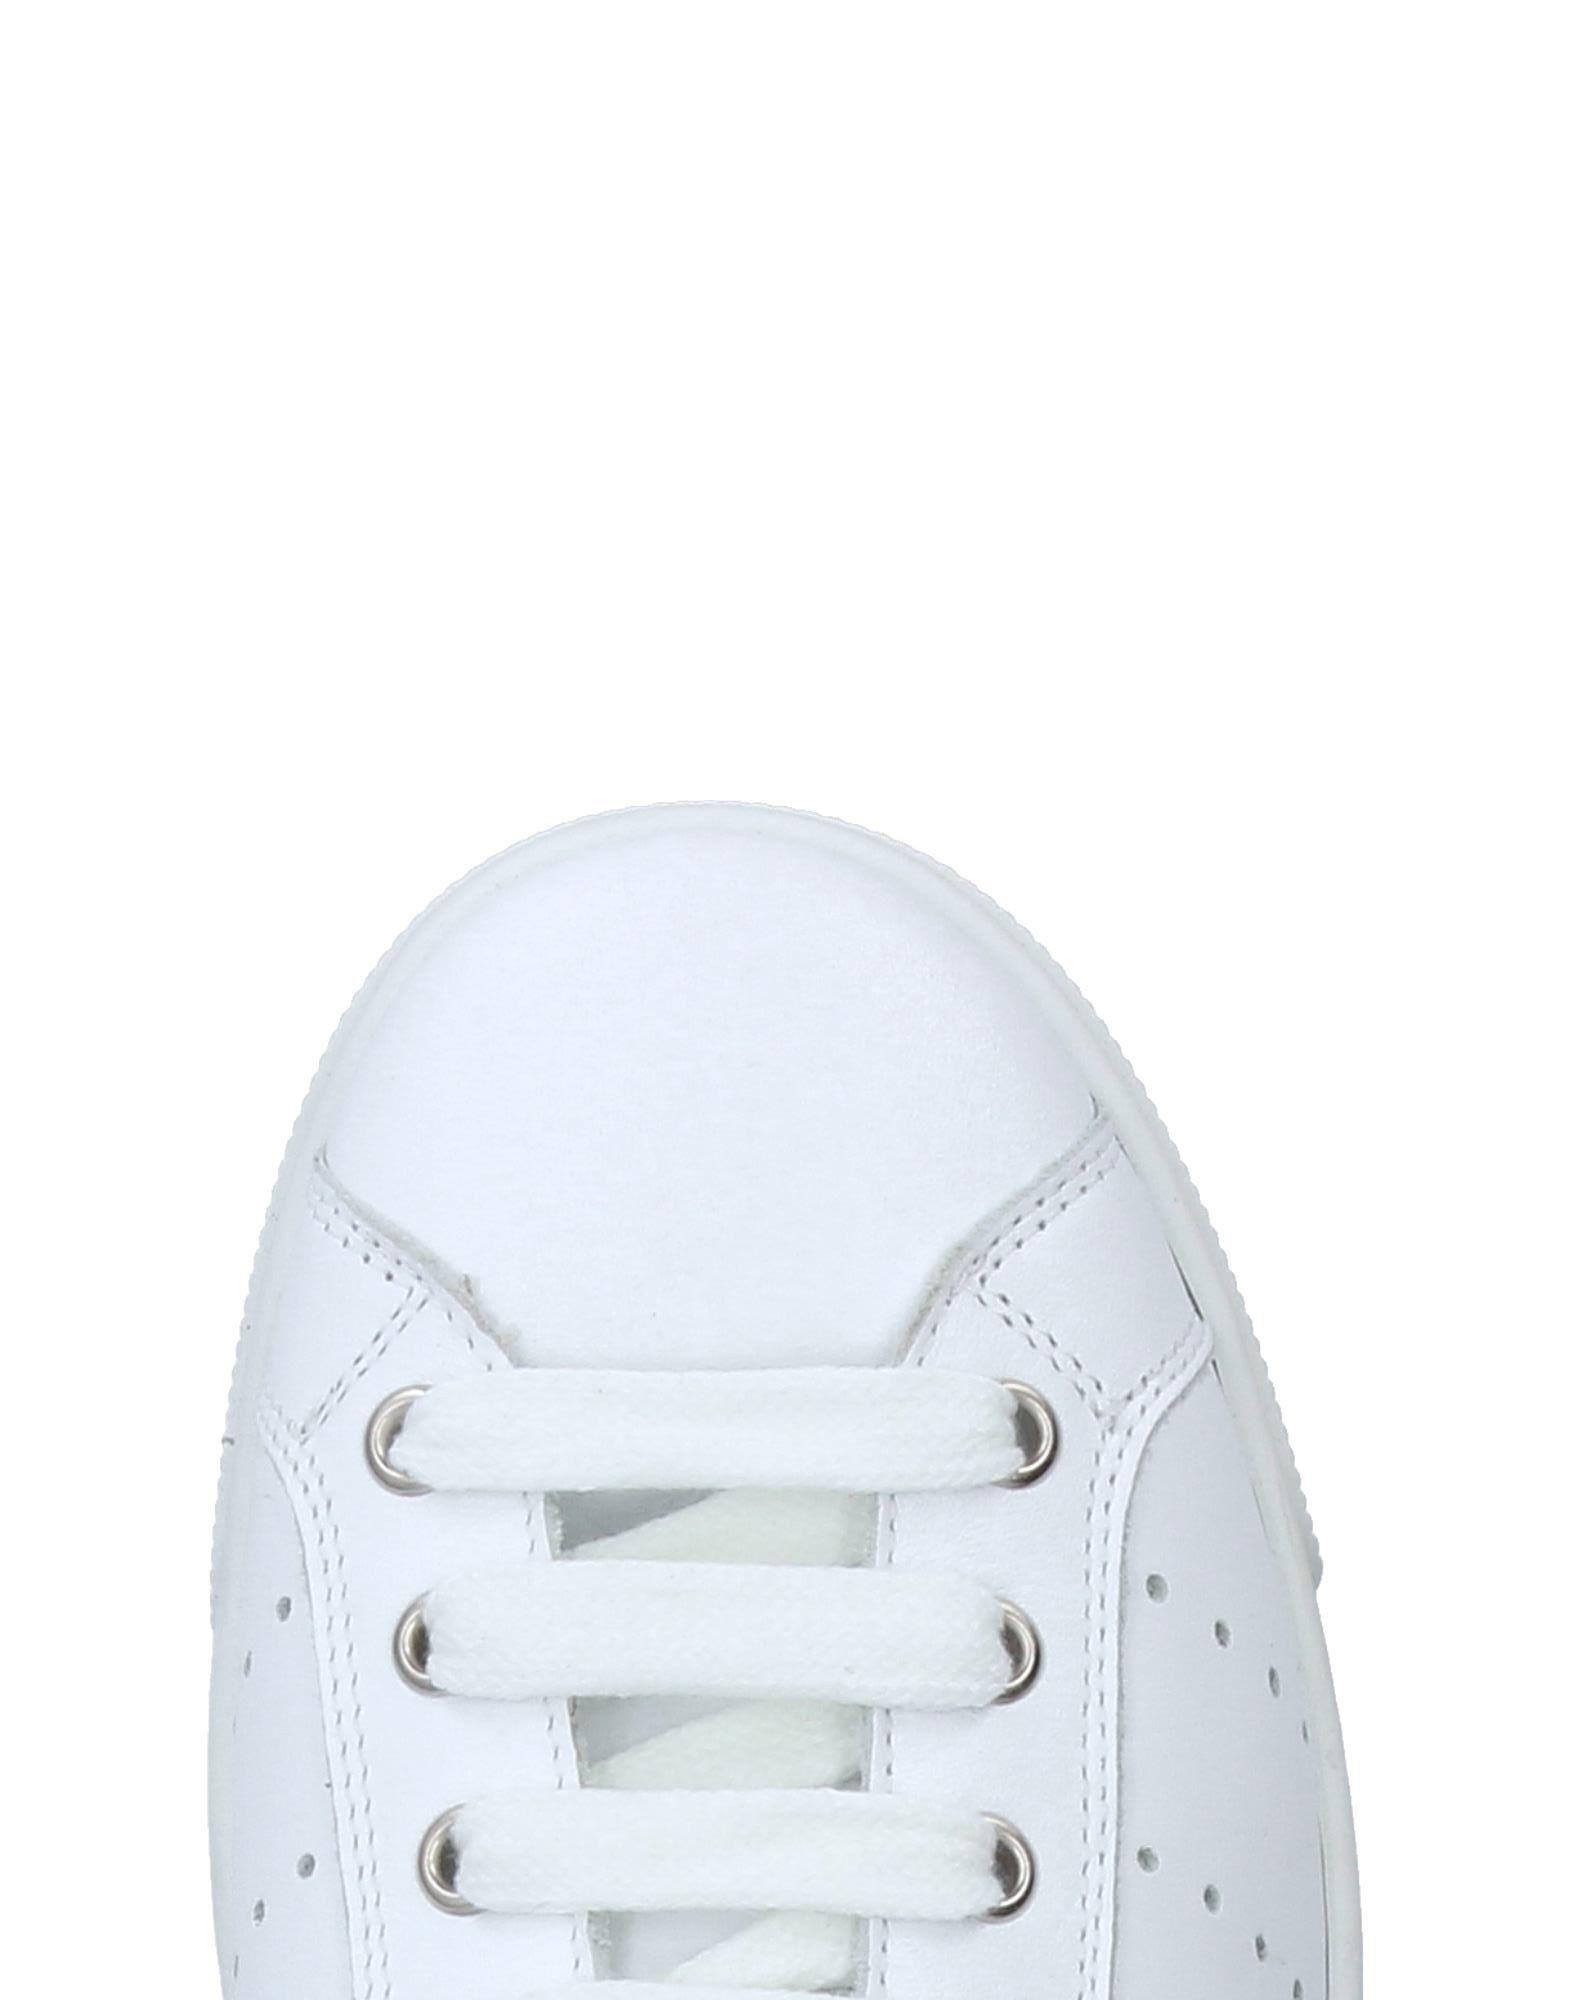 Dsquared2  Sneakers Damen  Dsquared2 11366195AHGut aussehende strapazierfähige Schuhe 7a8d4f